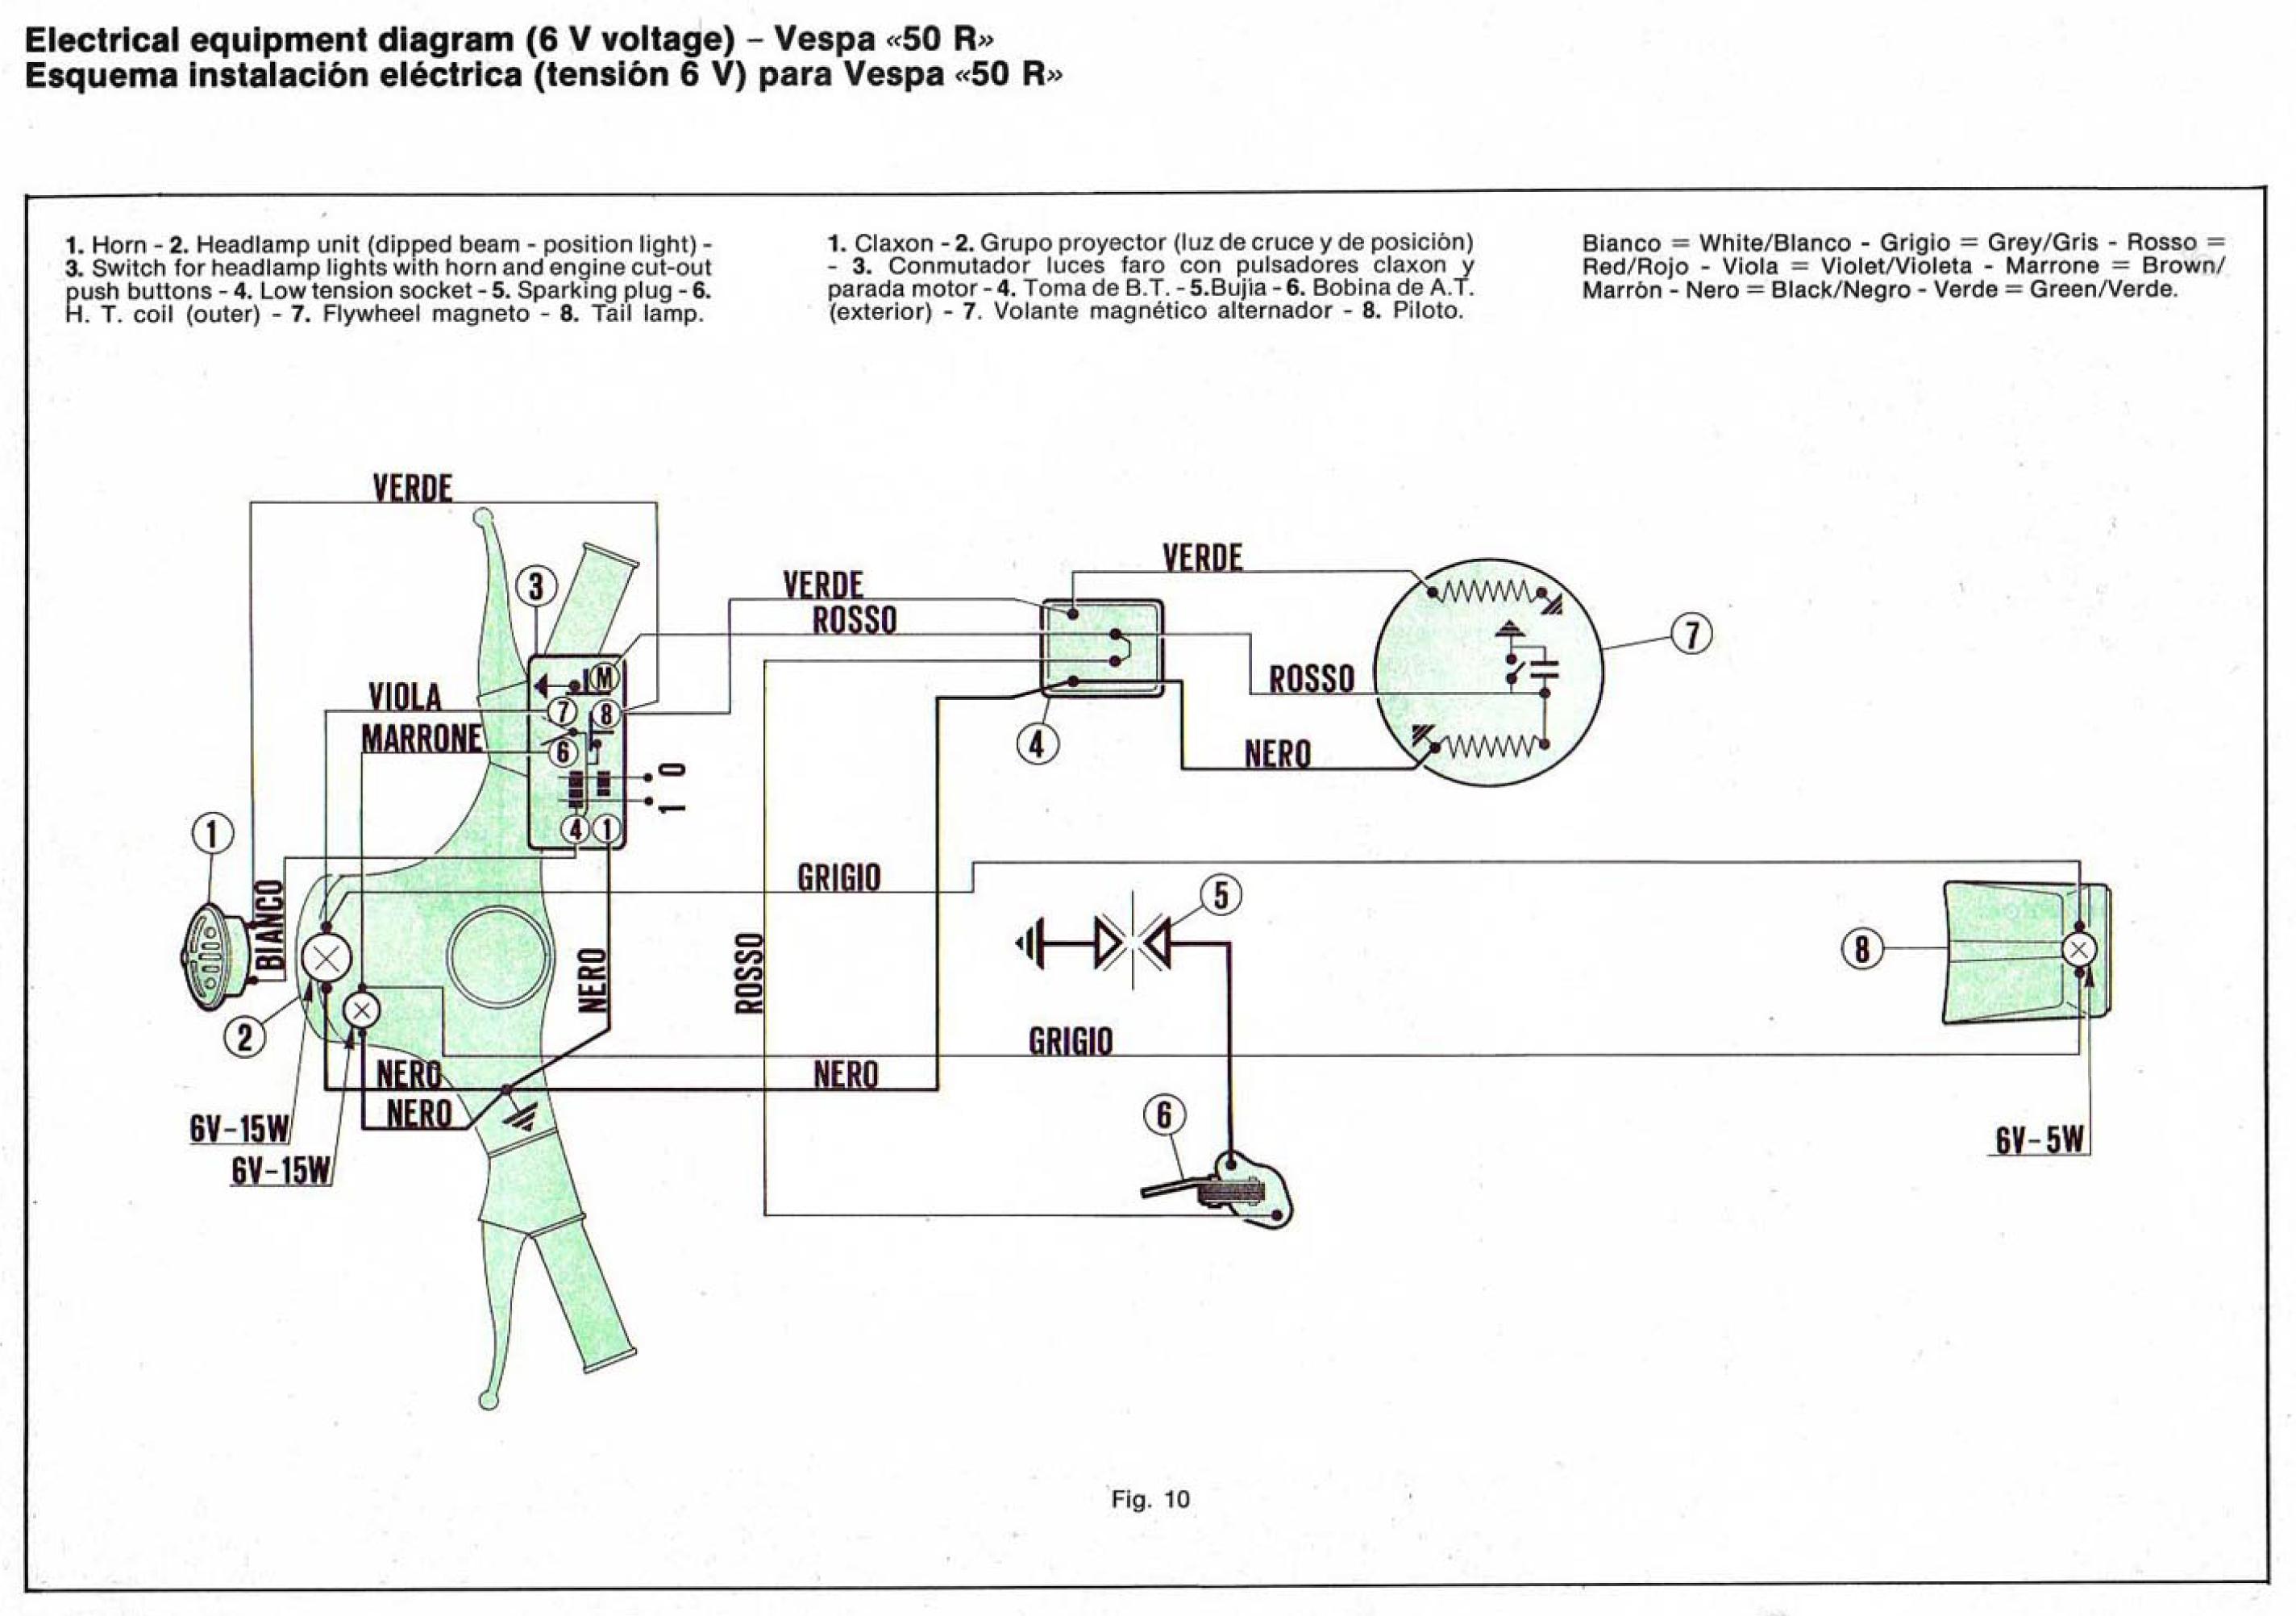 Gemütlich 240z Schaltplan Ideen - Schaltplan Serie Circuit ...